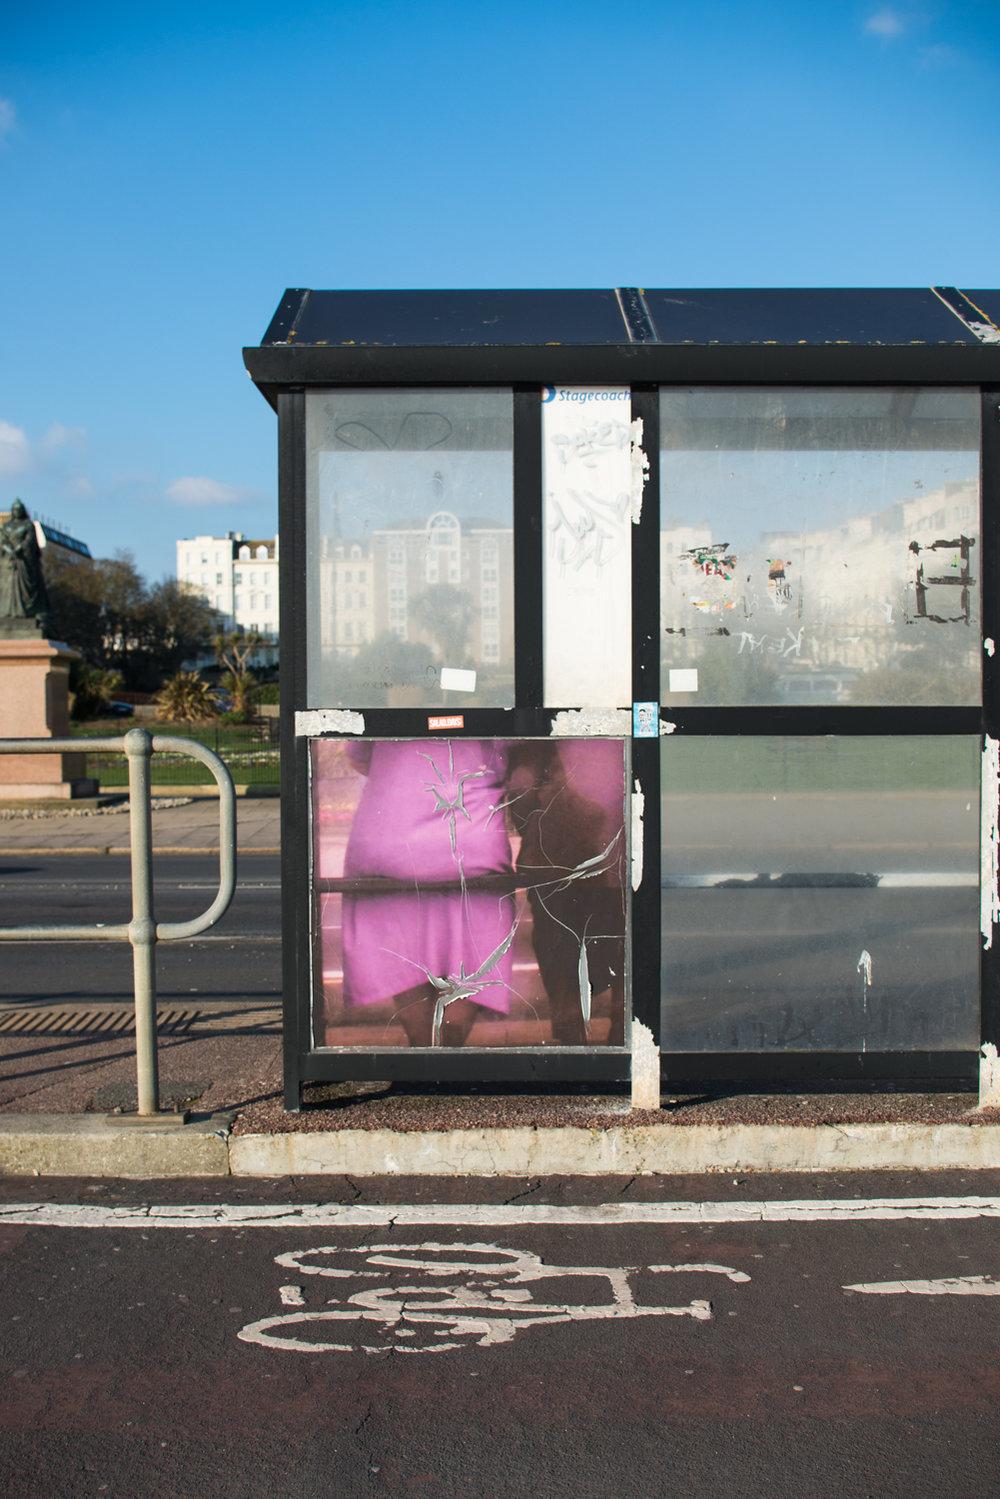 Warrior Square Bus Stop